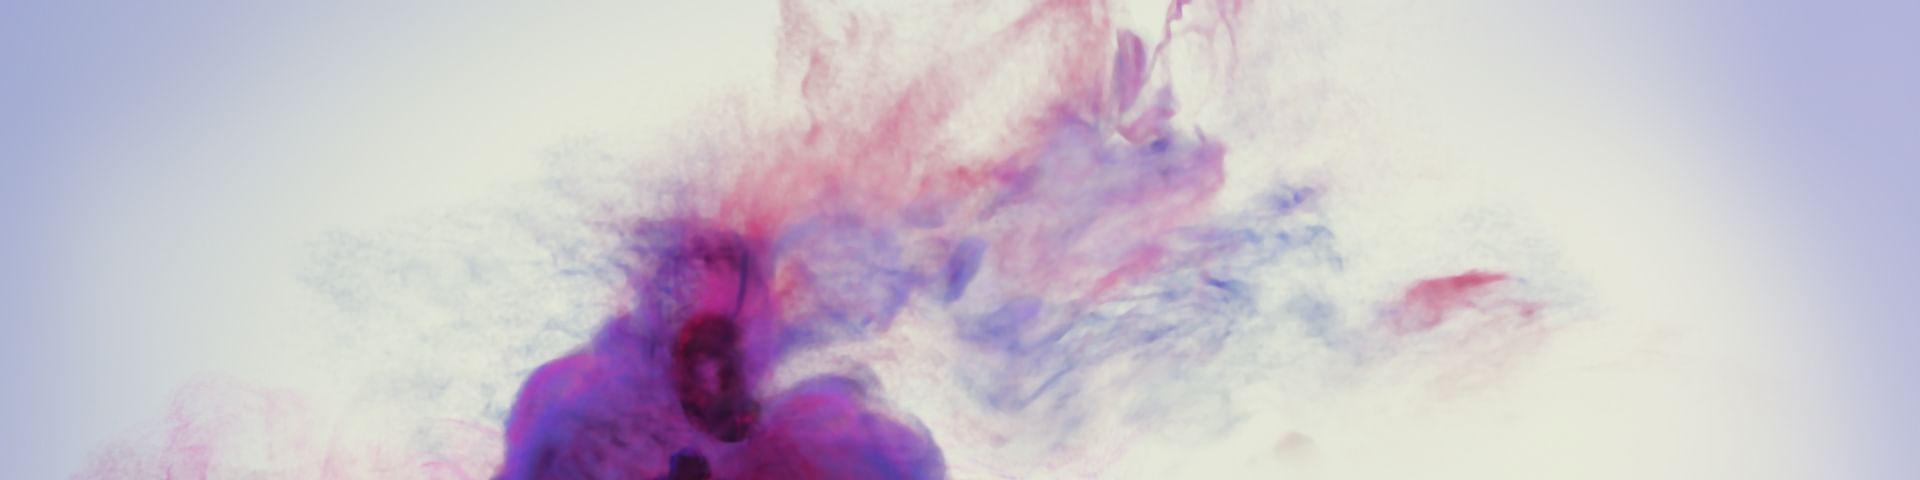 Re: Ocupa Barcelona